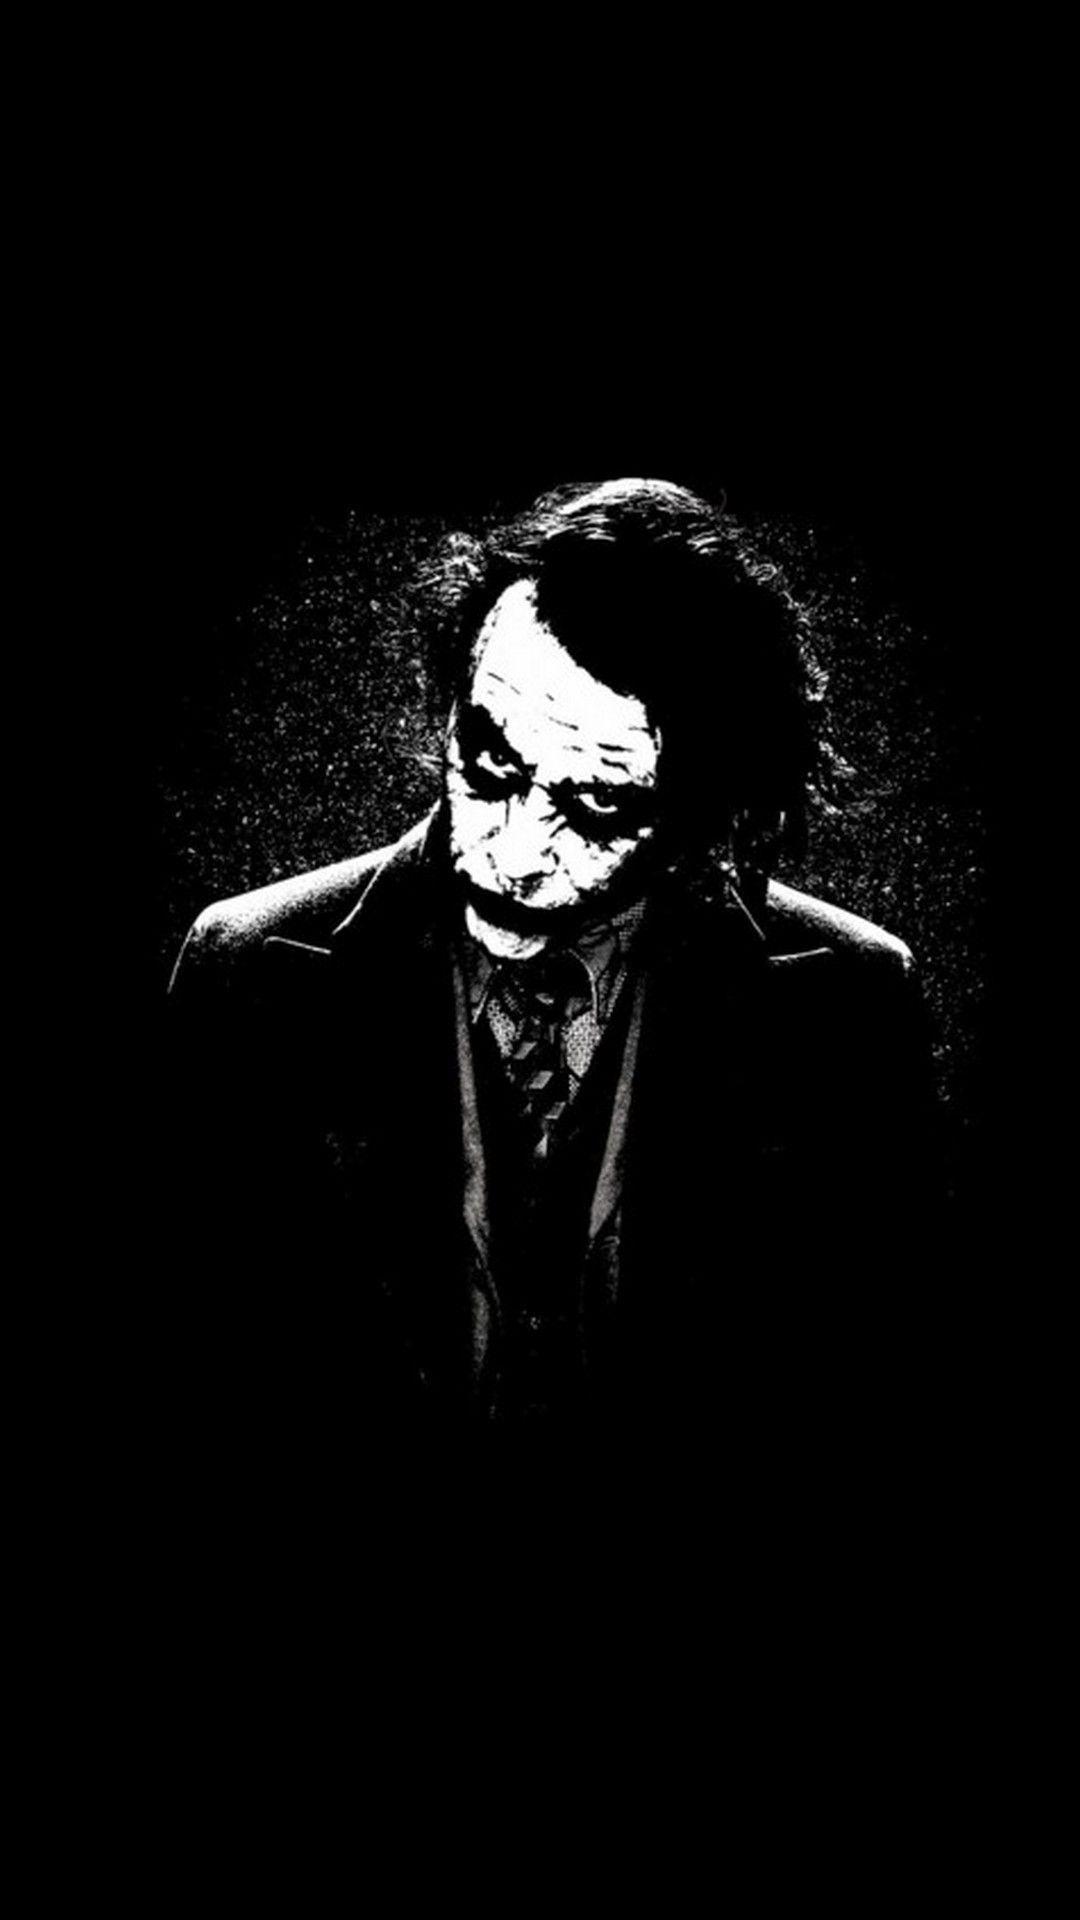 Joker Black And White Wallpapers Top Free Joker Black And White